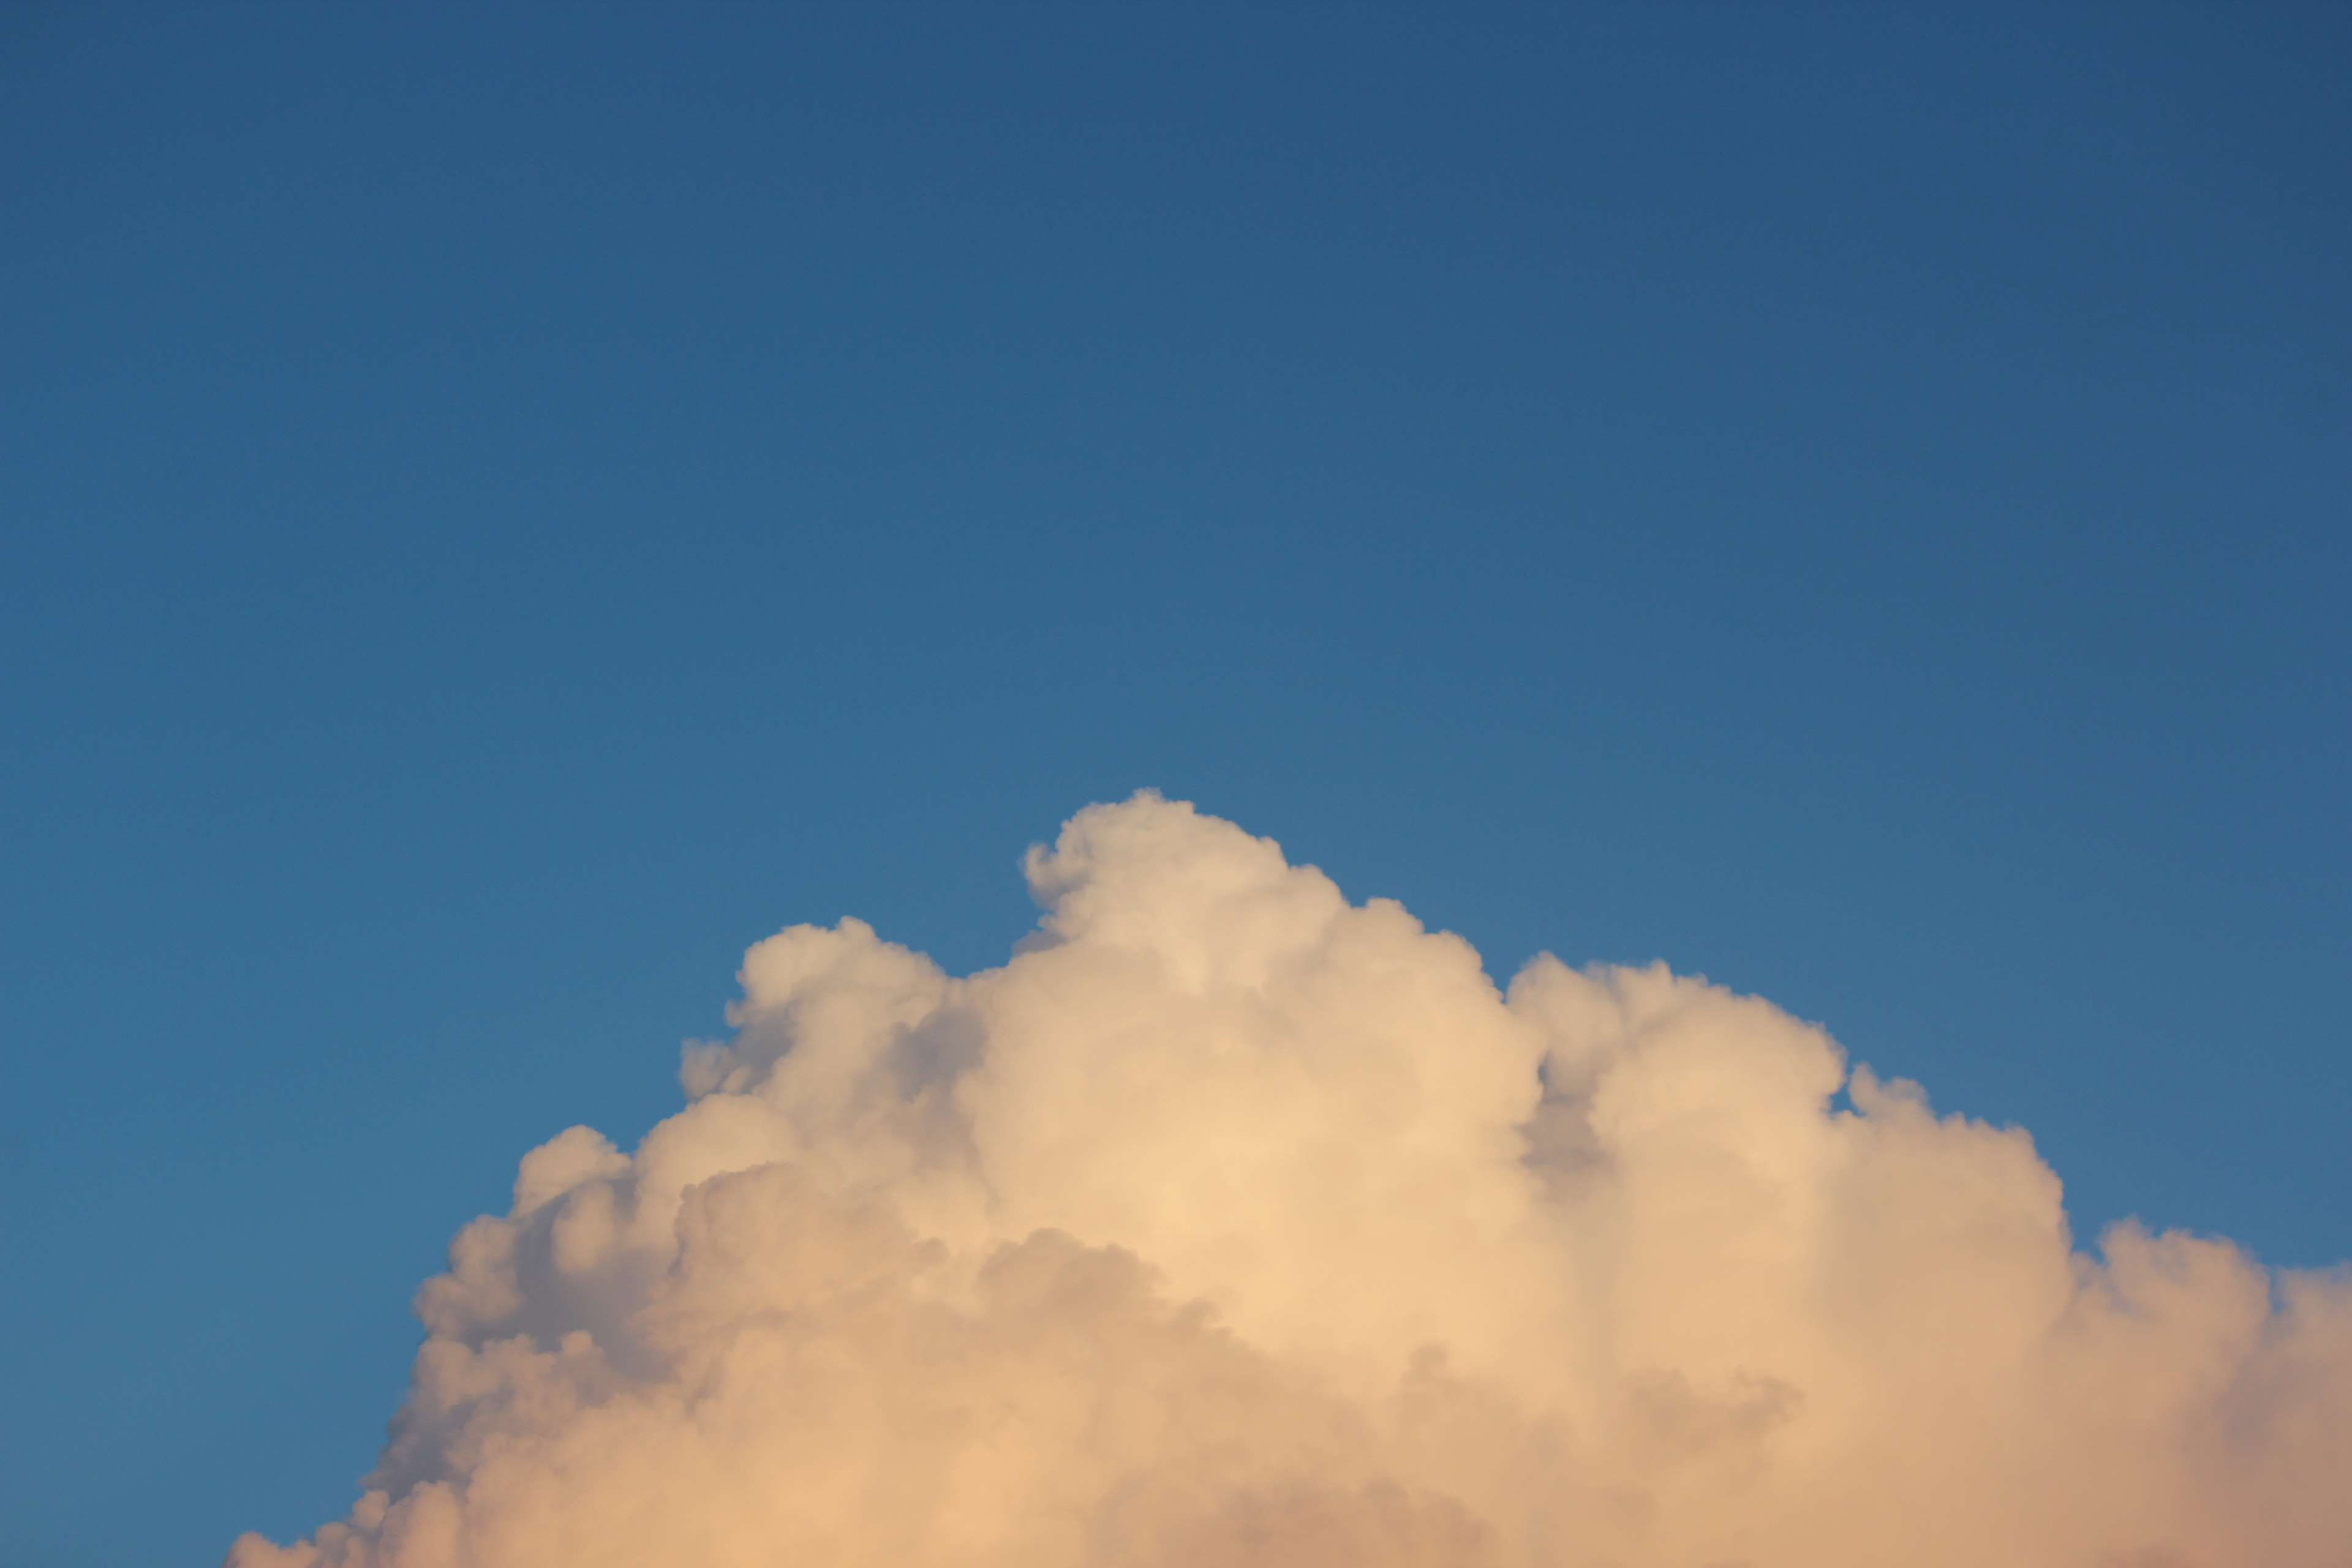 Alone Cloud Desktop Wallpaper Life Lonely Minimalism